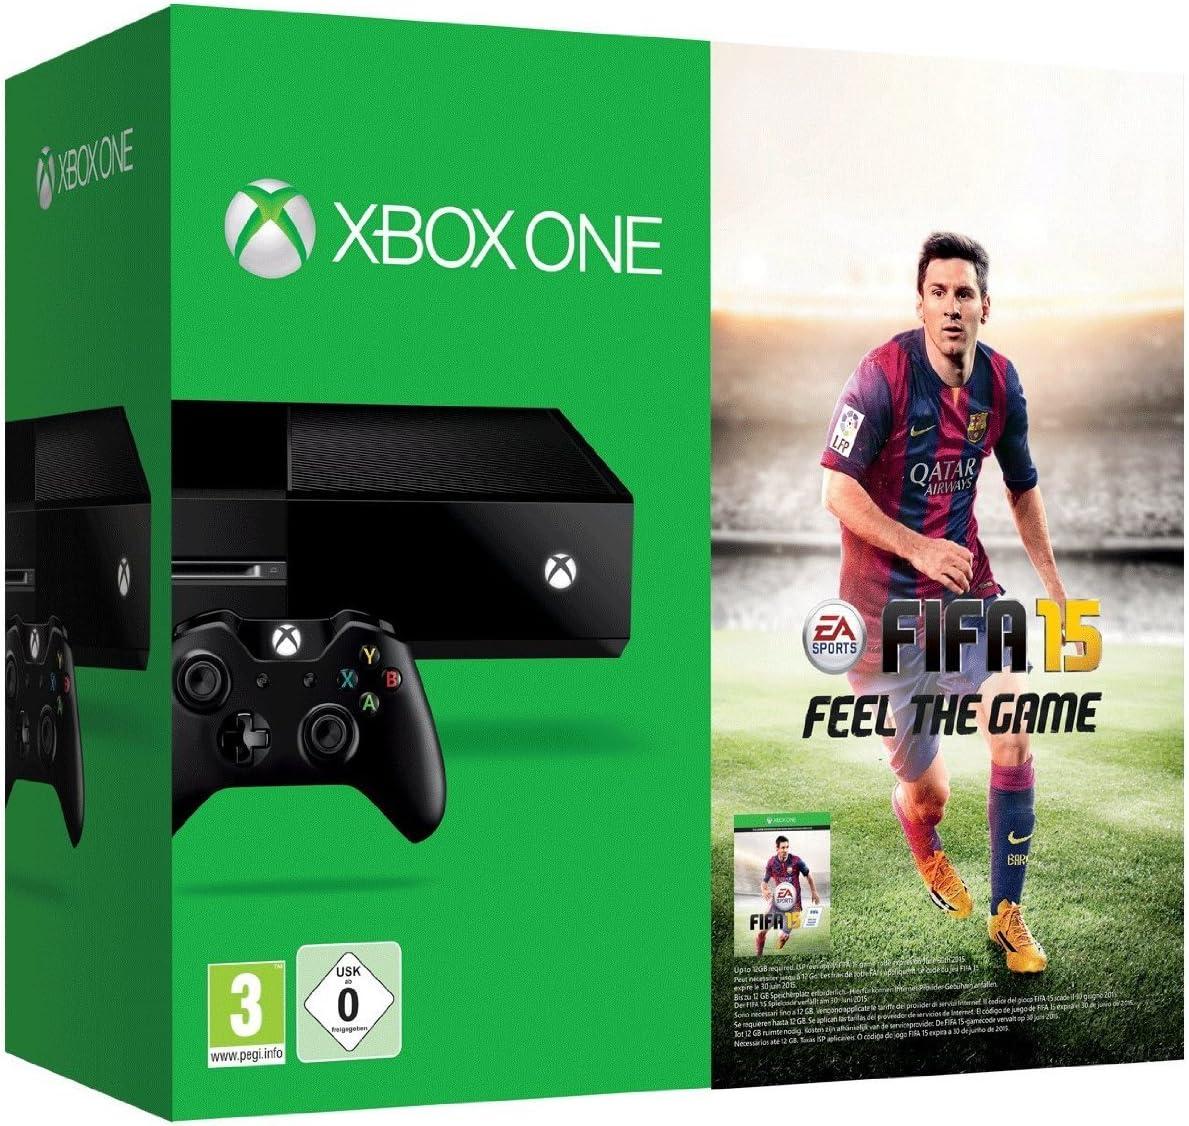 Microsoft Xbox One + FIFA 15 - juegos de PC (Xbox One, 500 MB, DDR3, Blu-Ray, 500 GB, 230V) Negro: Amazon.es: Videojuegos